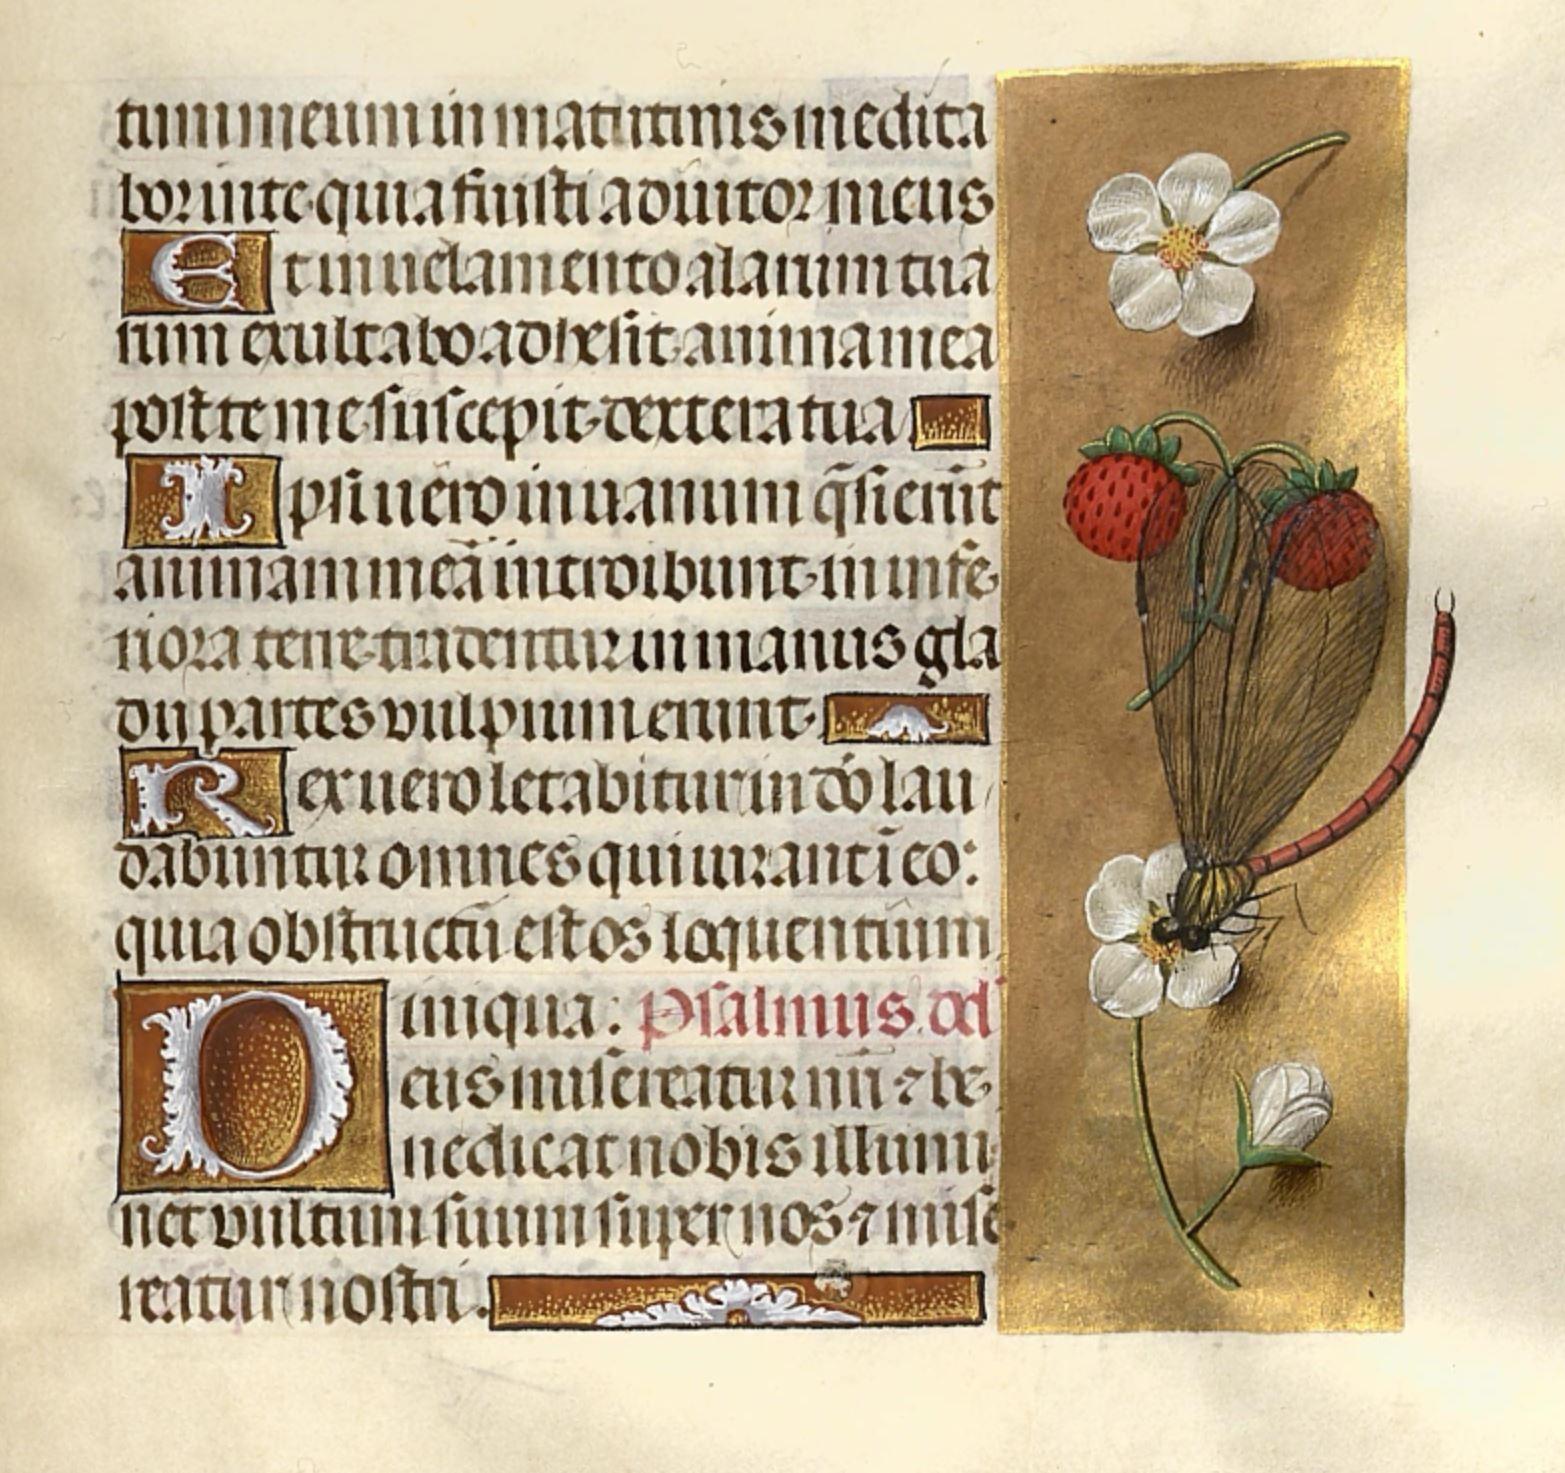 1483-98 Horae Beatae Mariae Virginis (La Flora, pour Charles VIII) Biblioteca nazionale Napoli Ms. I. B. 51 fol 224